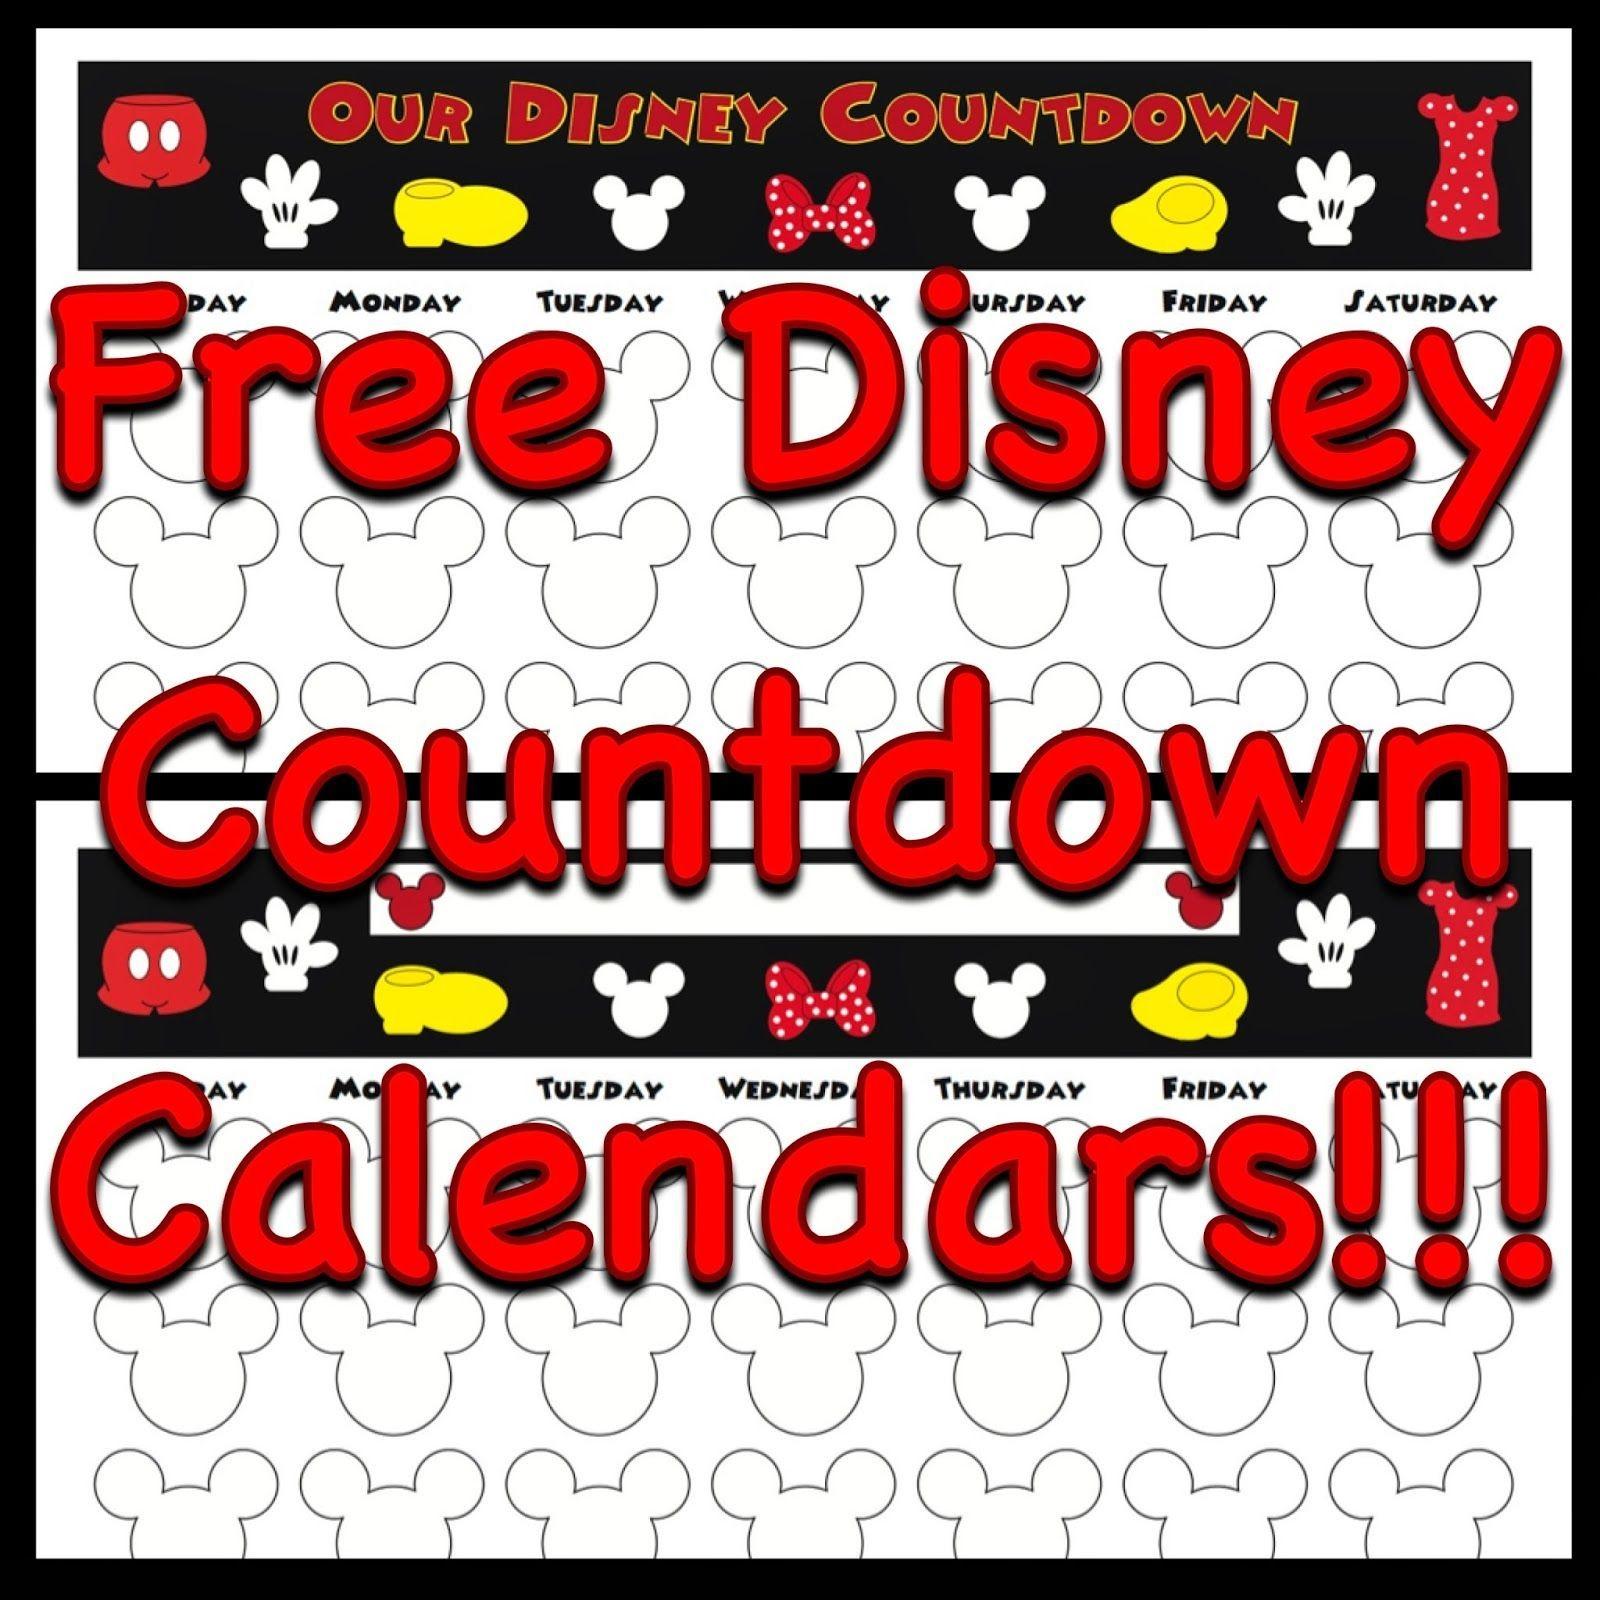 Countdown Calendars | Disney Calendar, Disney Countdown